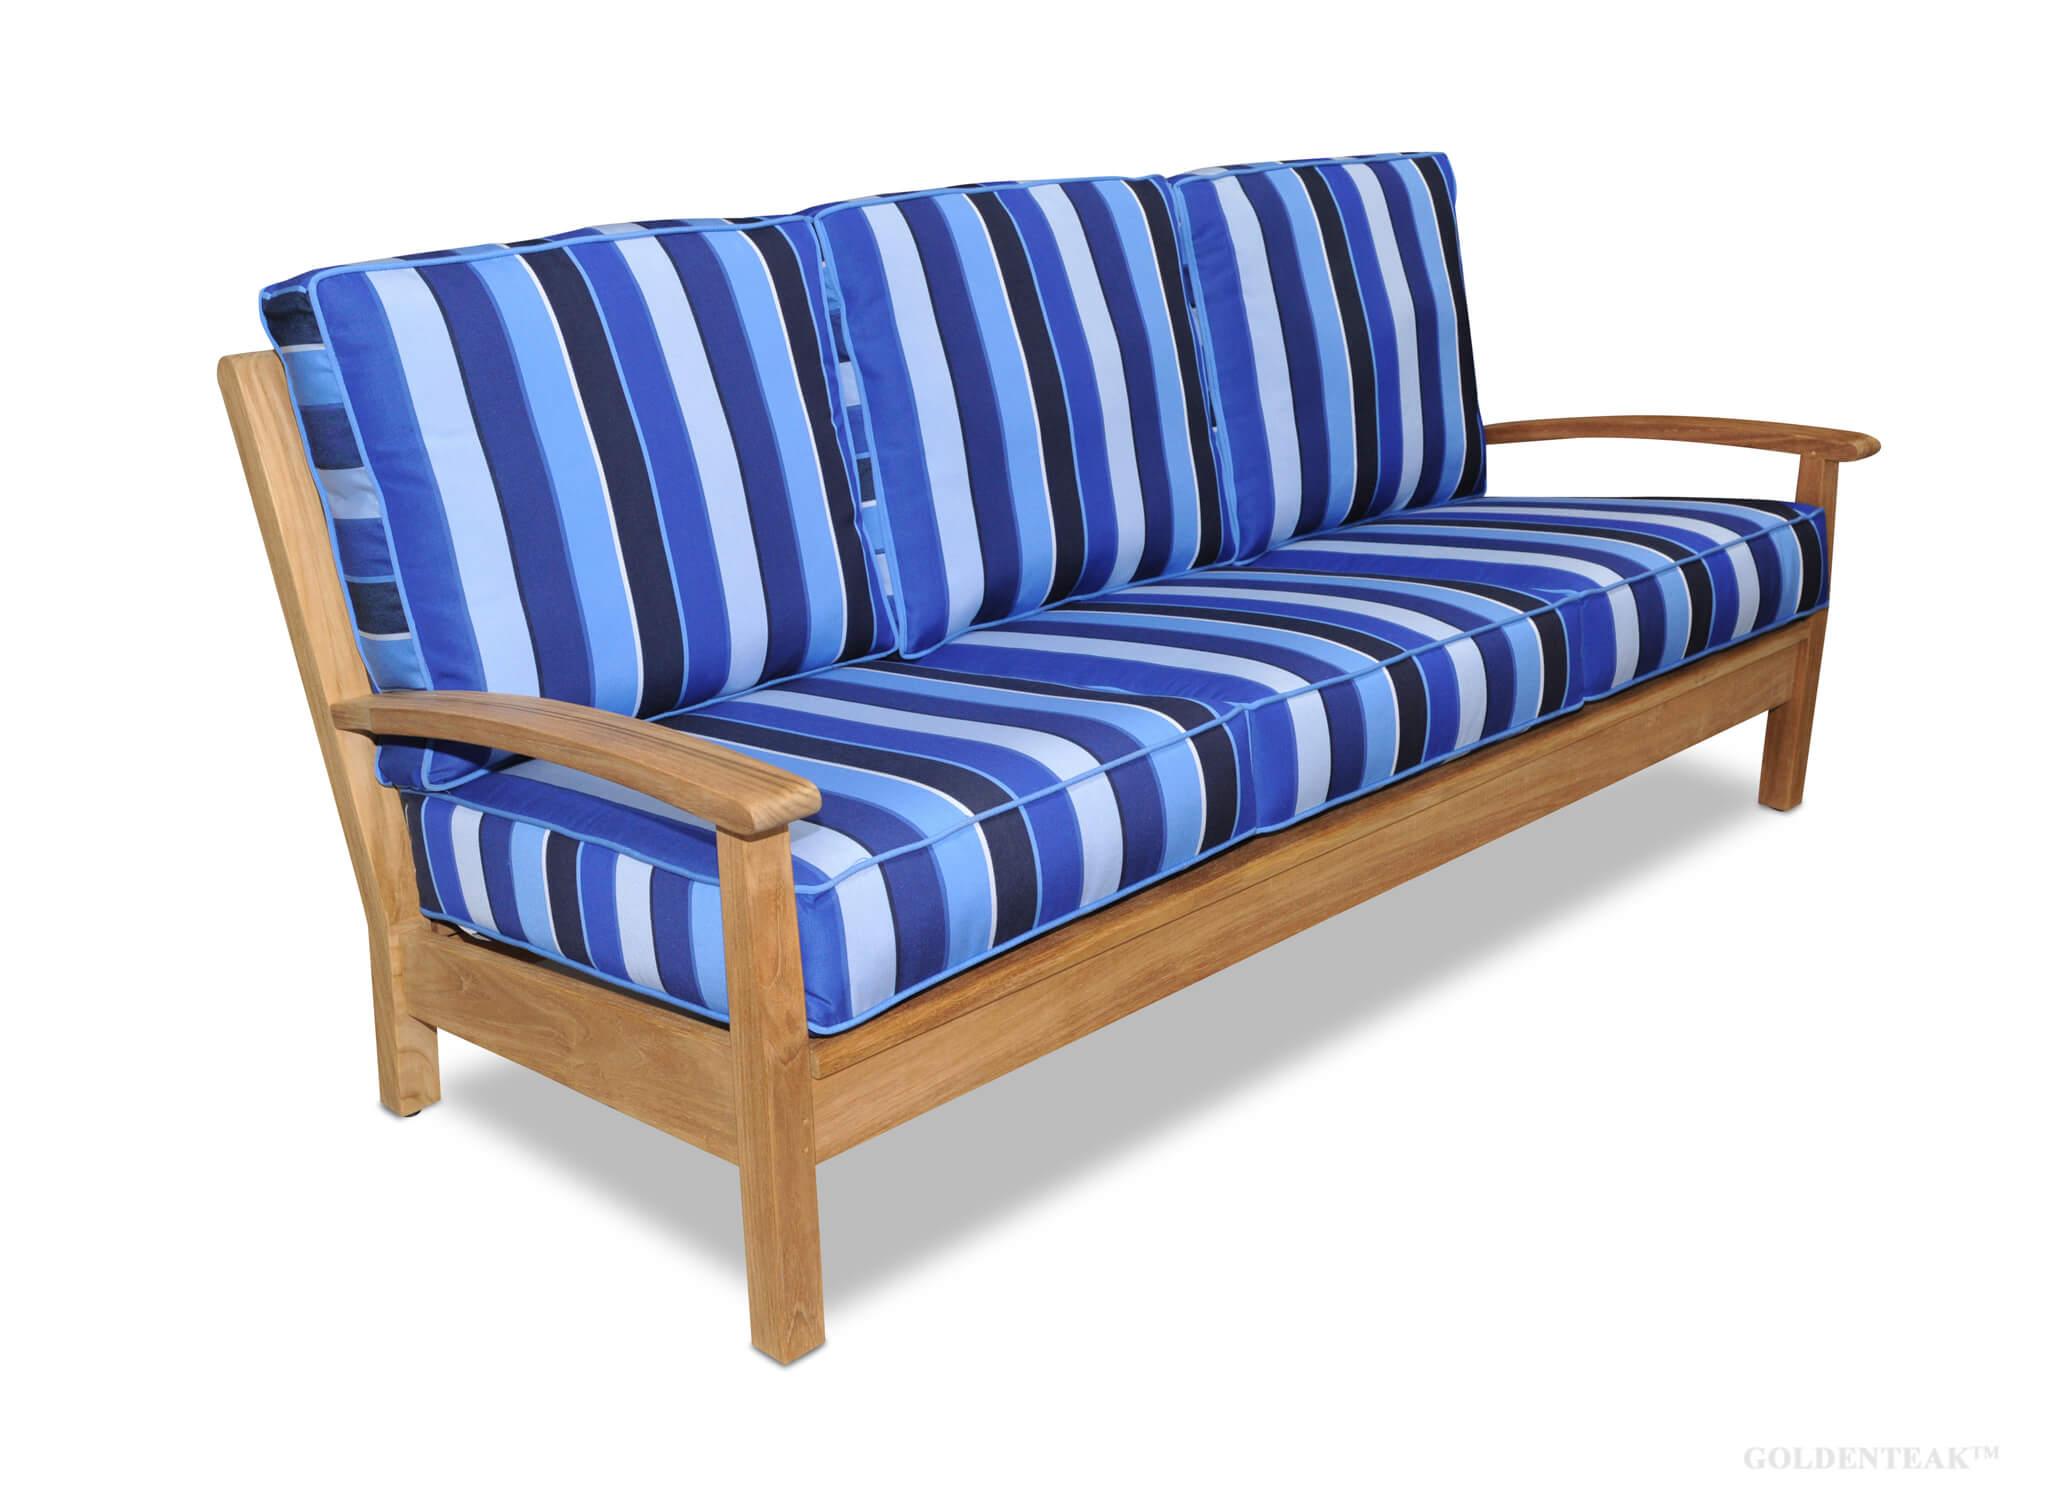 Teak Deep Seating Sofa, Chappy Collection | Teak Wood Furniture